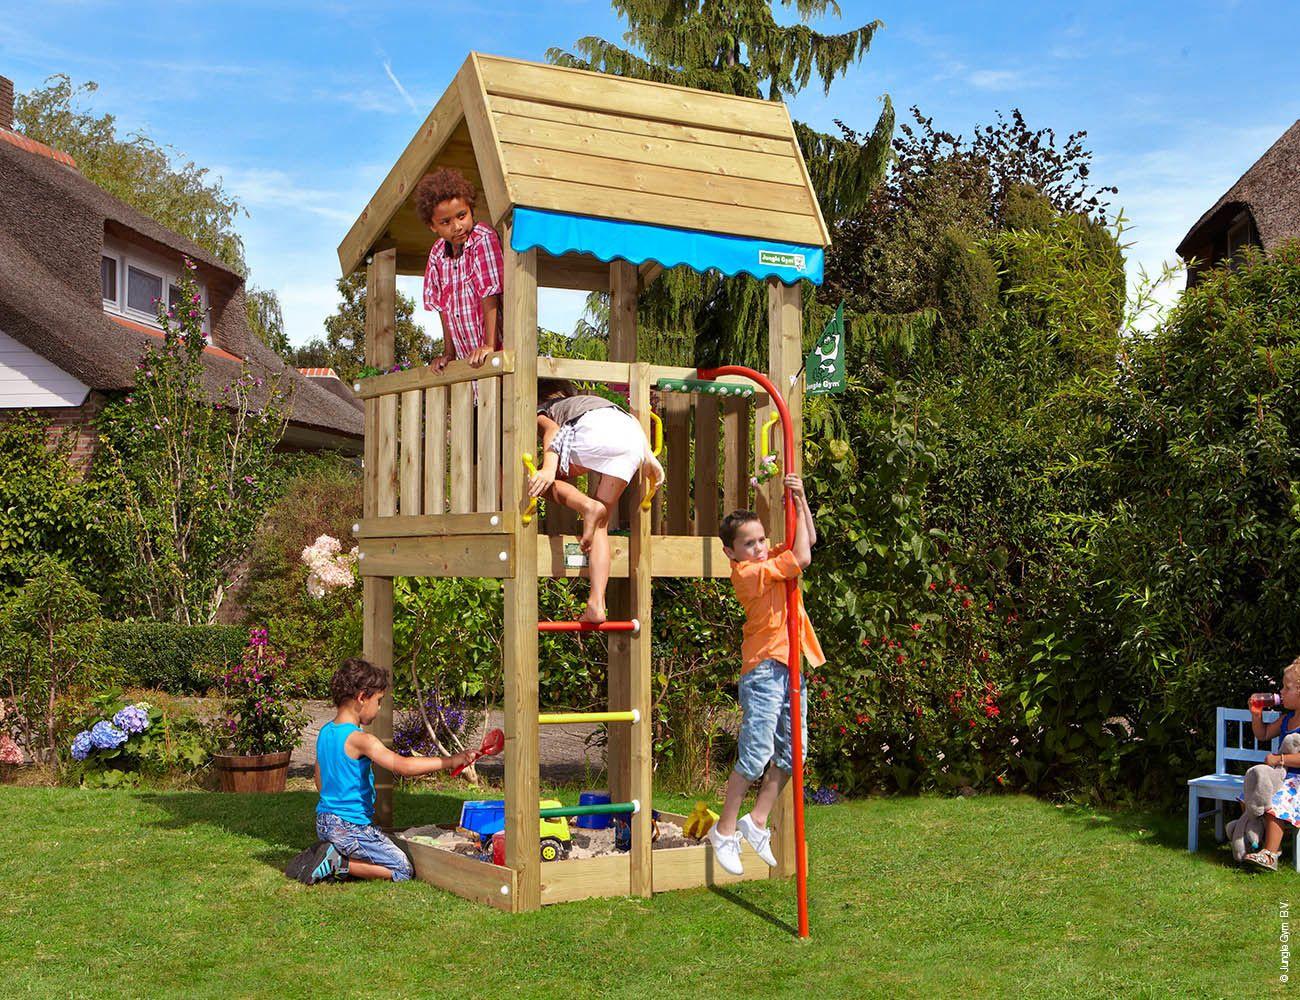 Jungle Gym Spielturm Home Fireman&39;s Pole   Galaxus